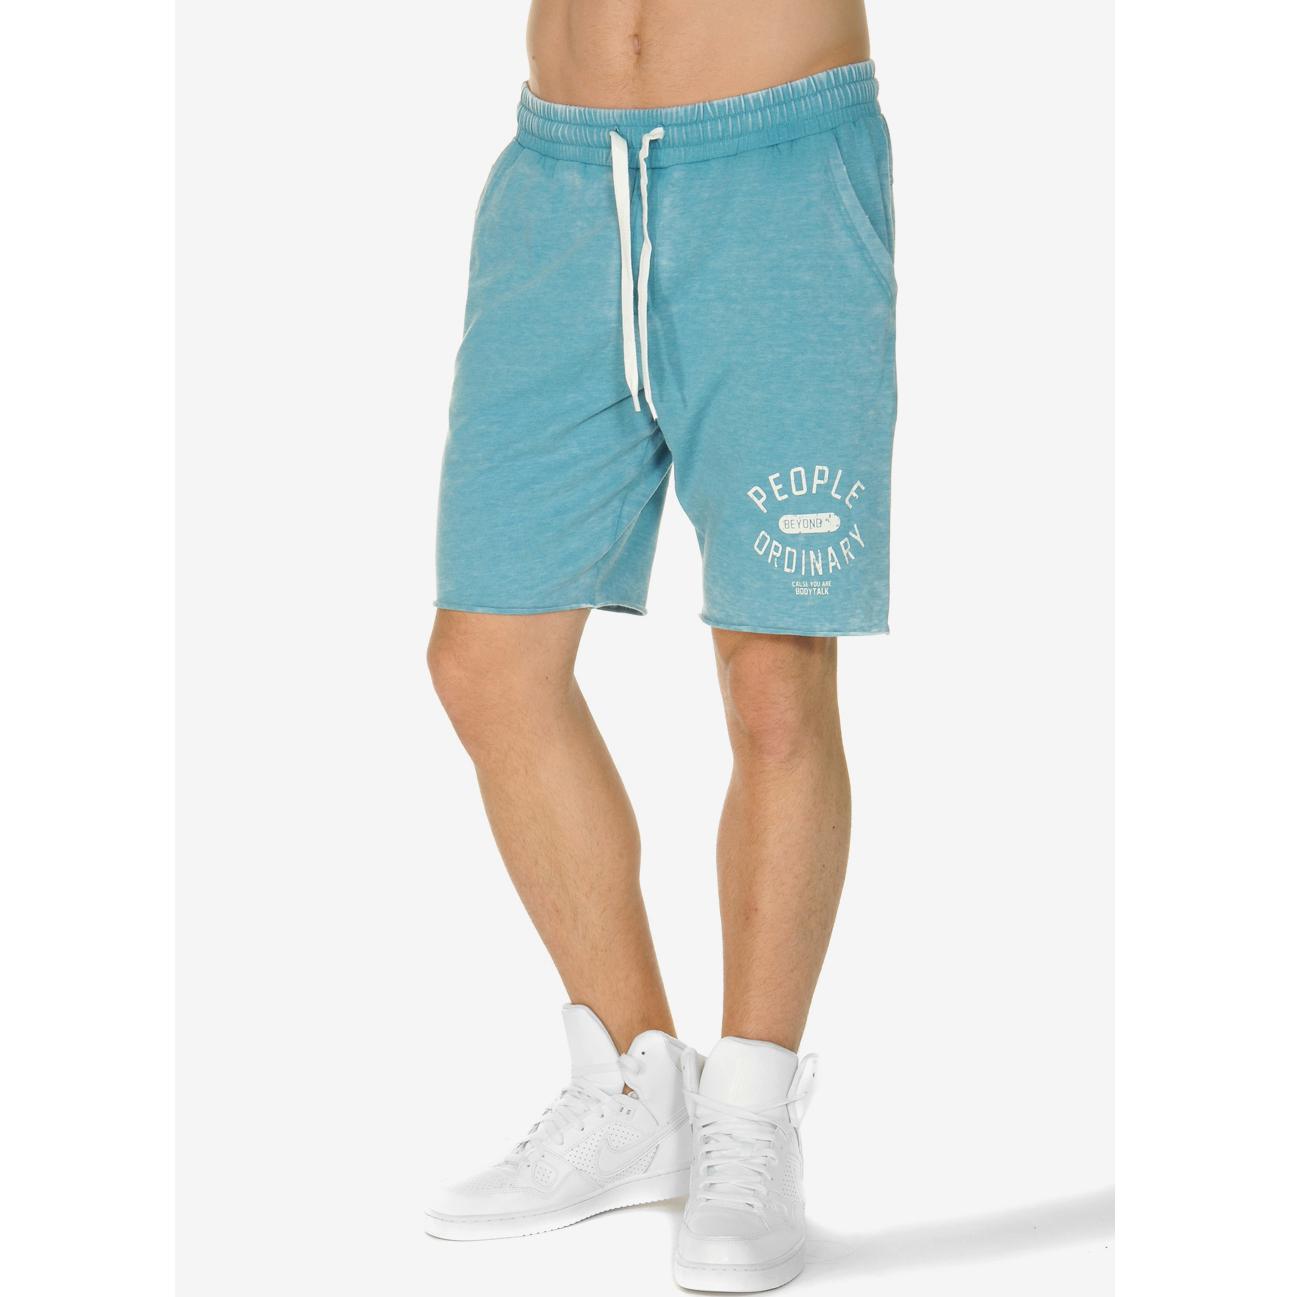 BODYTALK - Αντρική βερμούδα BODYTALK μπλε ανδρικά ρούχα σορτς βερμούδες αθλητικά